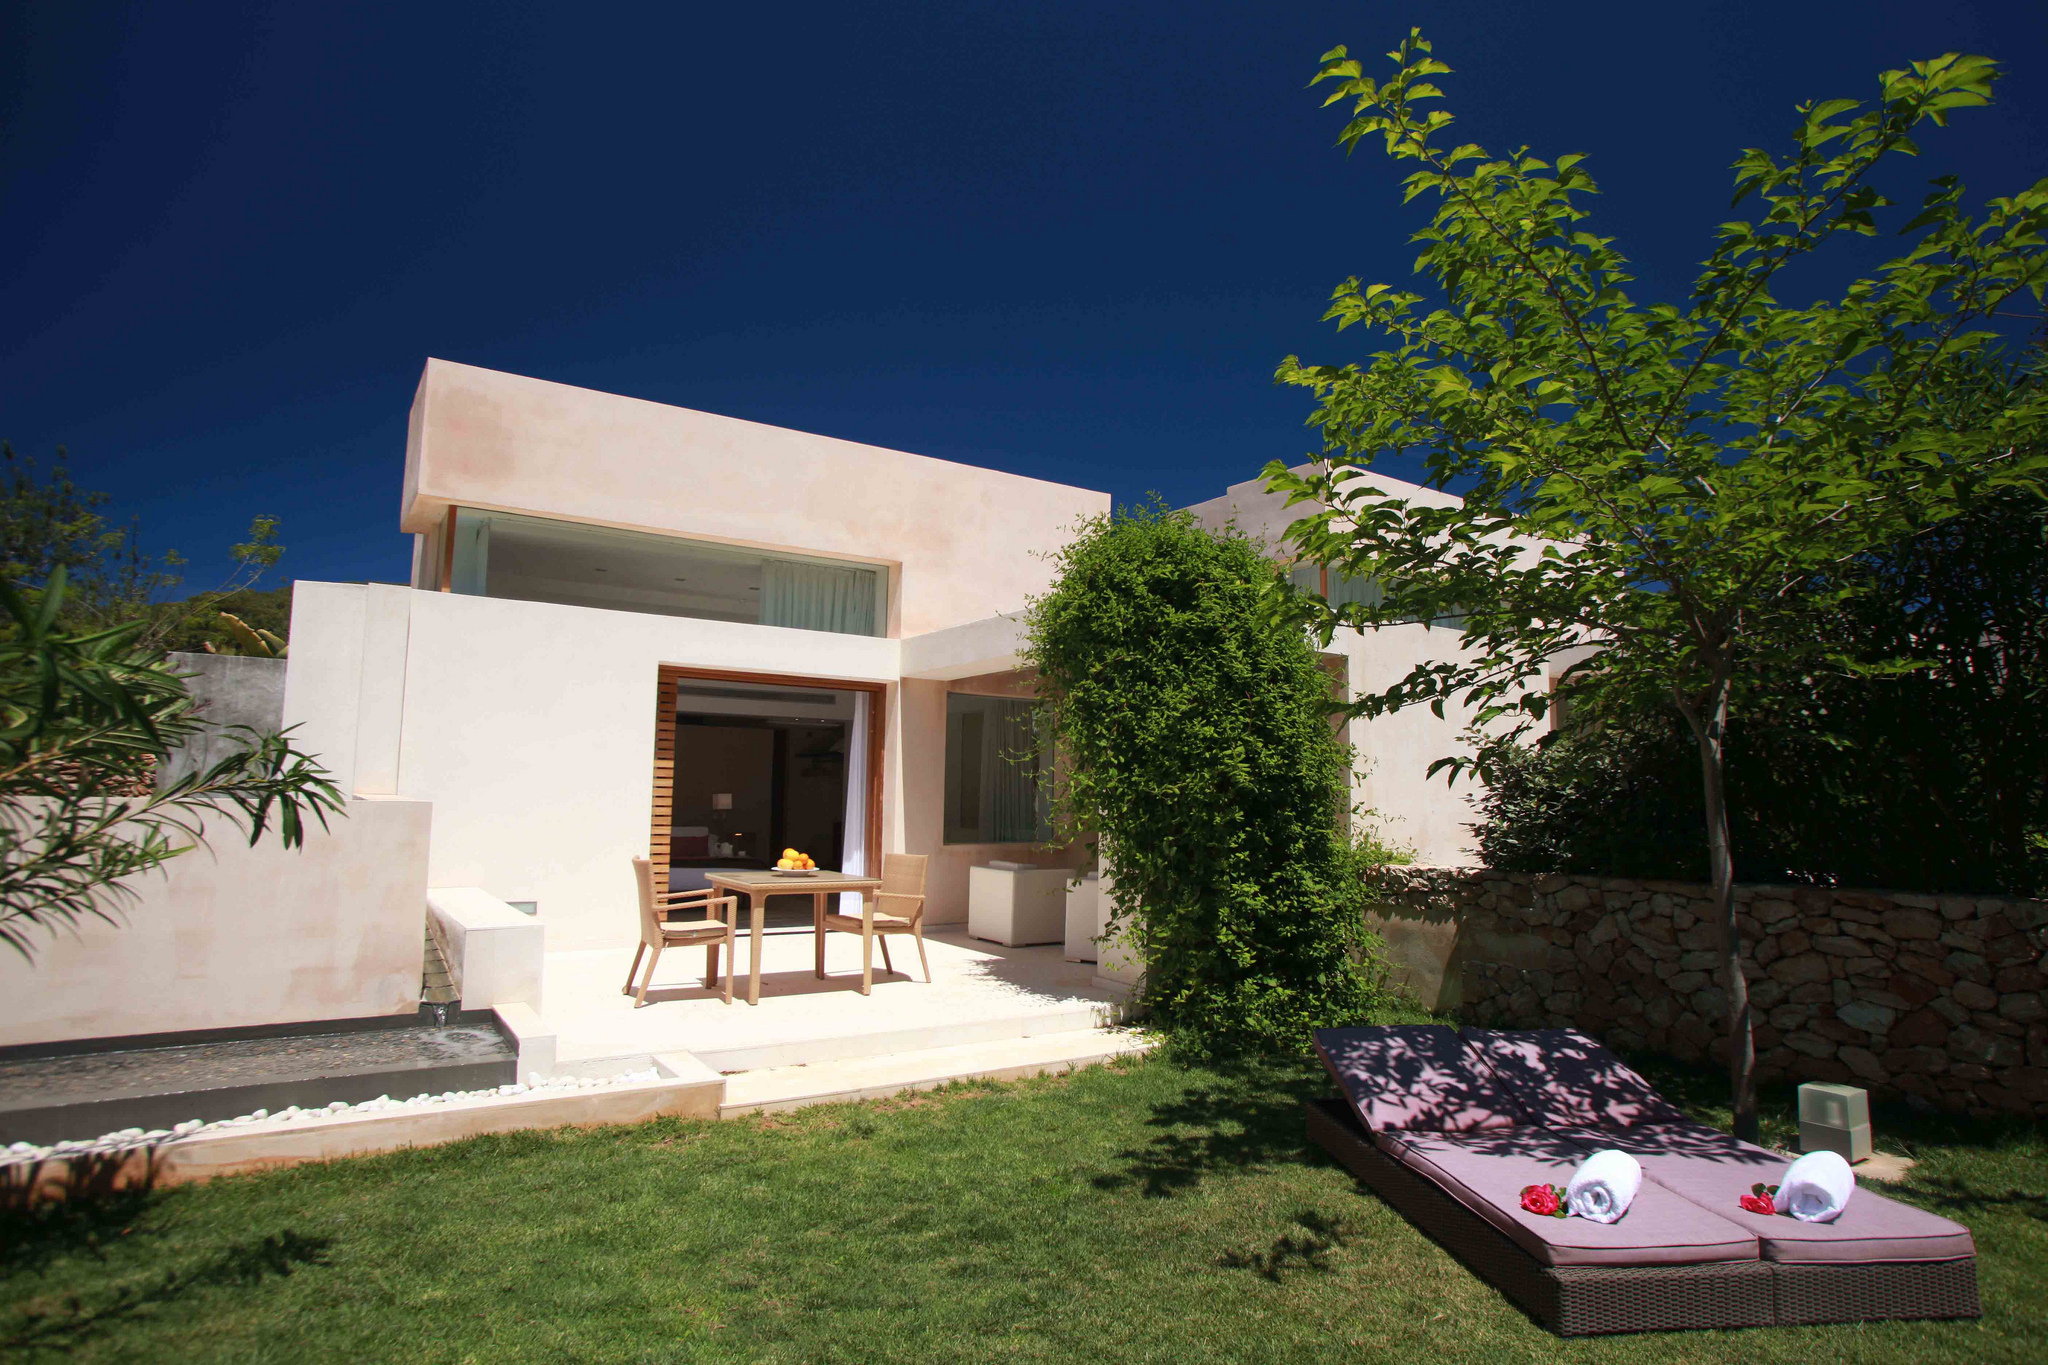 ibiza-vacation-tailor-made